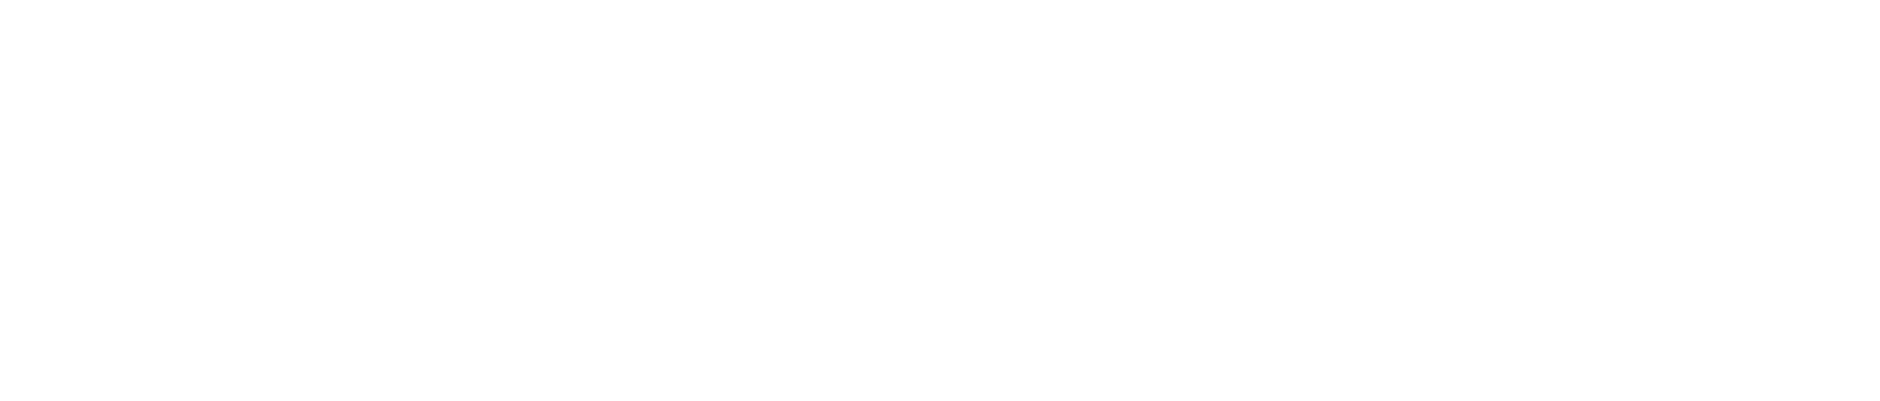 SONG X JAZZ